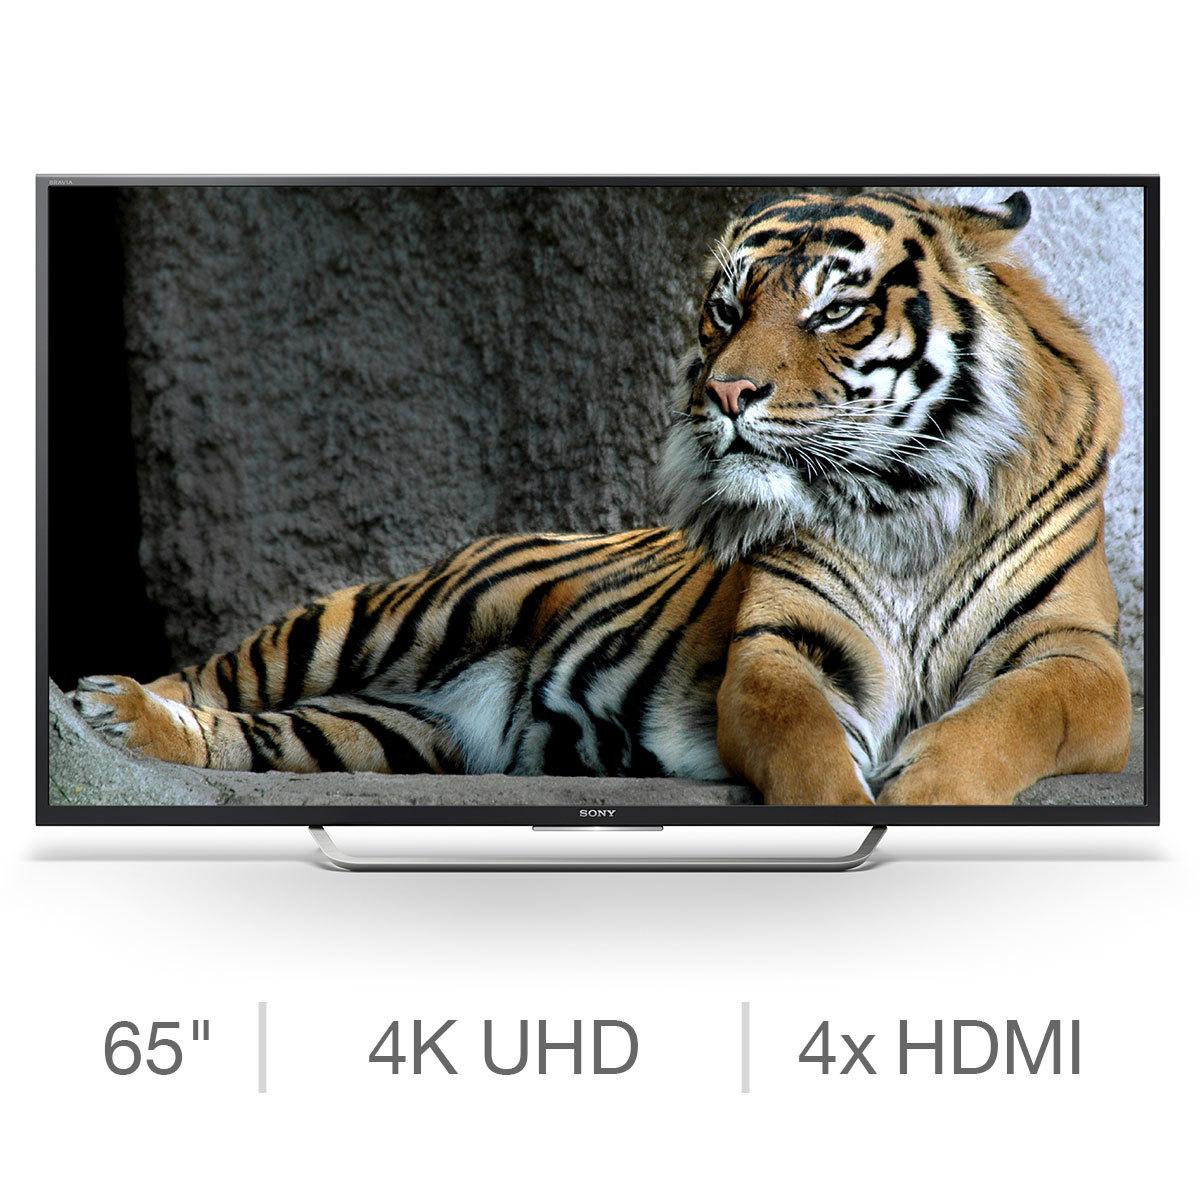 Sony Bravia KD65XD7505 65 Inch 4K Ultra HD Smart TV - £999.99 @ Costco